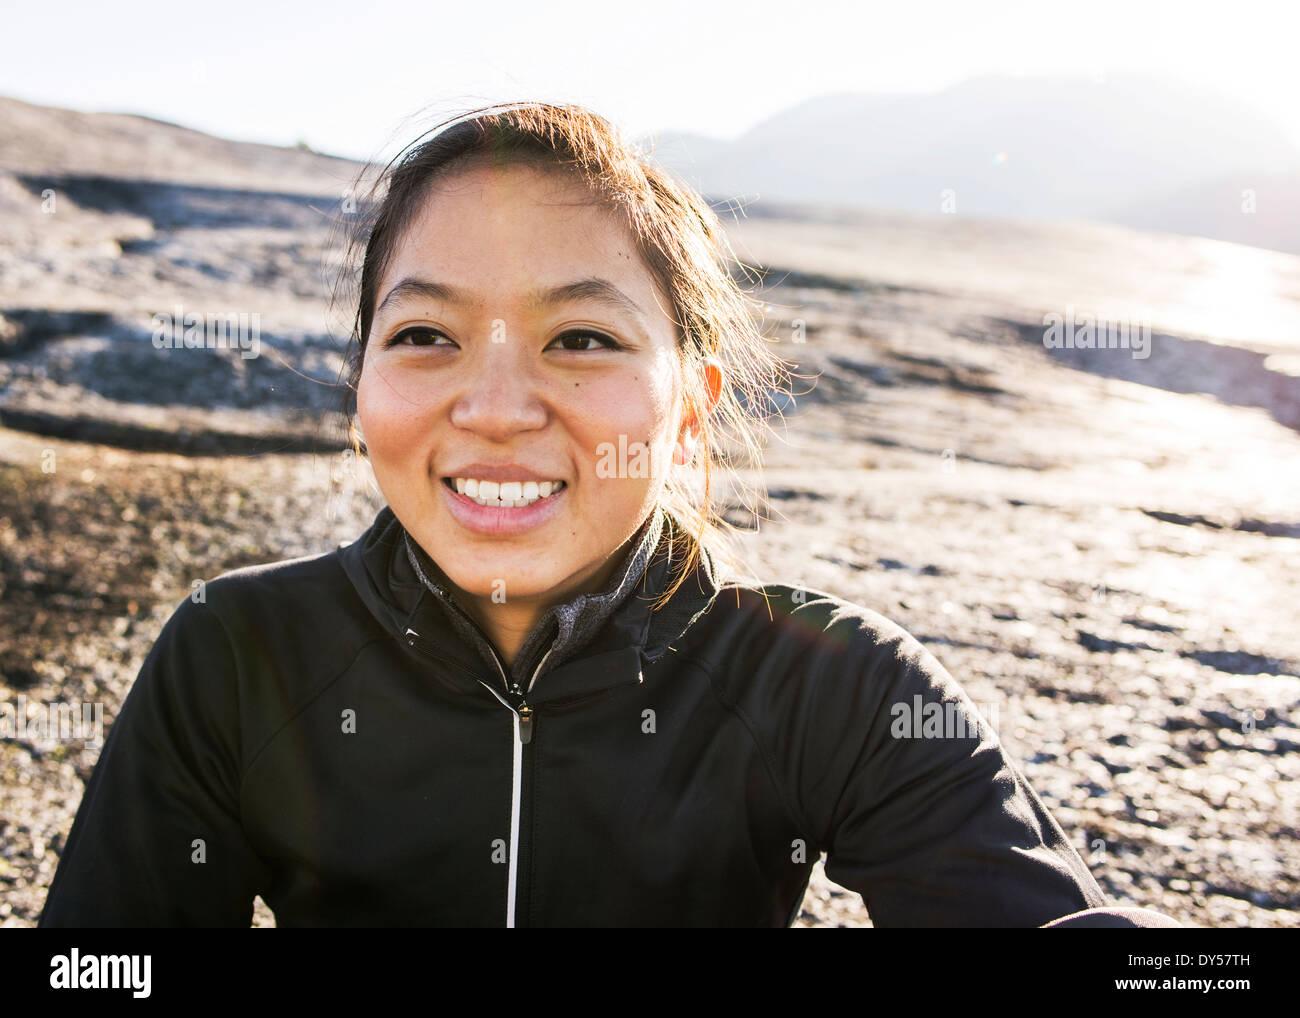 Retrato de mujer joven excursionista, Squamish, British Columbia, Canadá Imagen De Stock